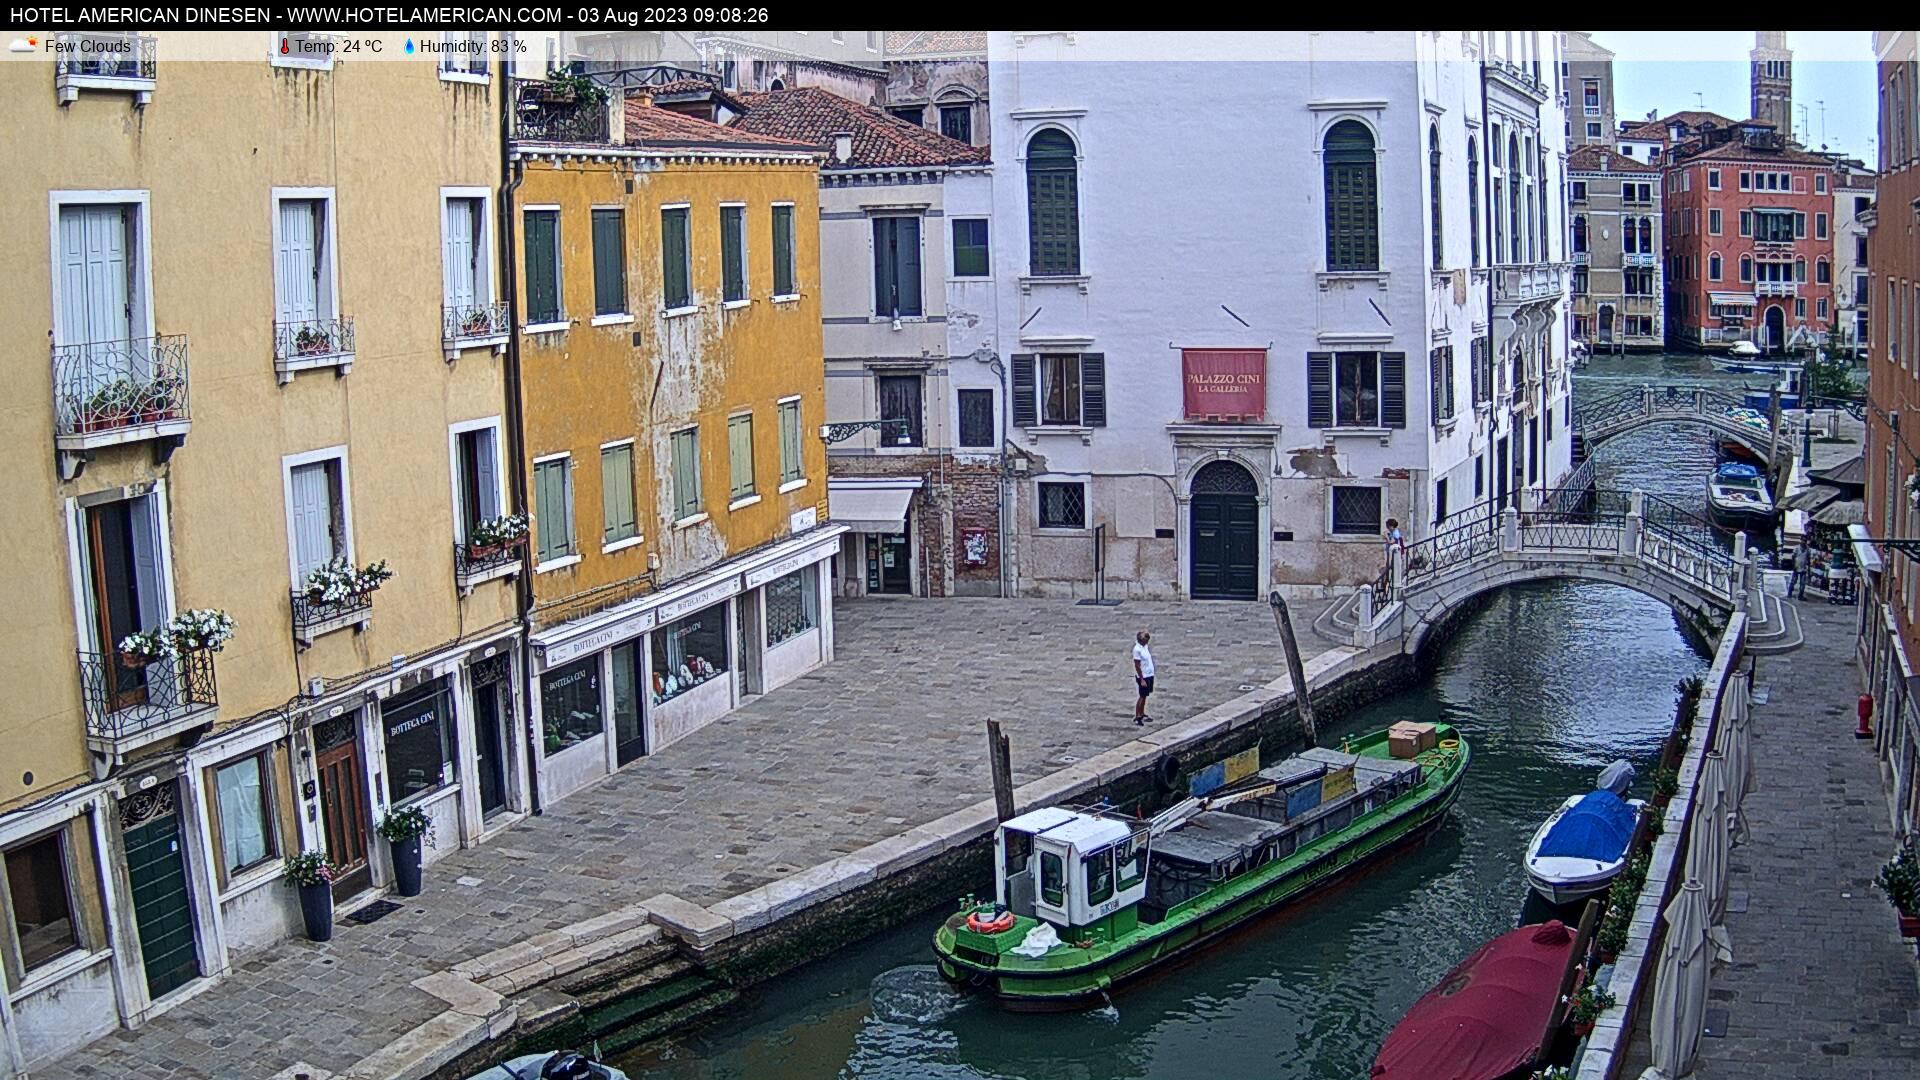 Venedig Sa. 09:08